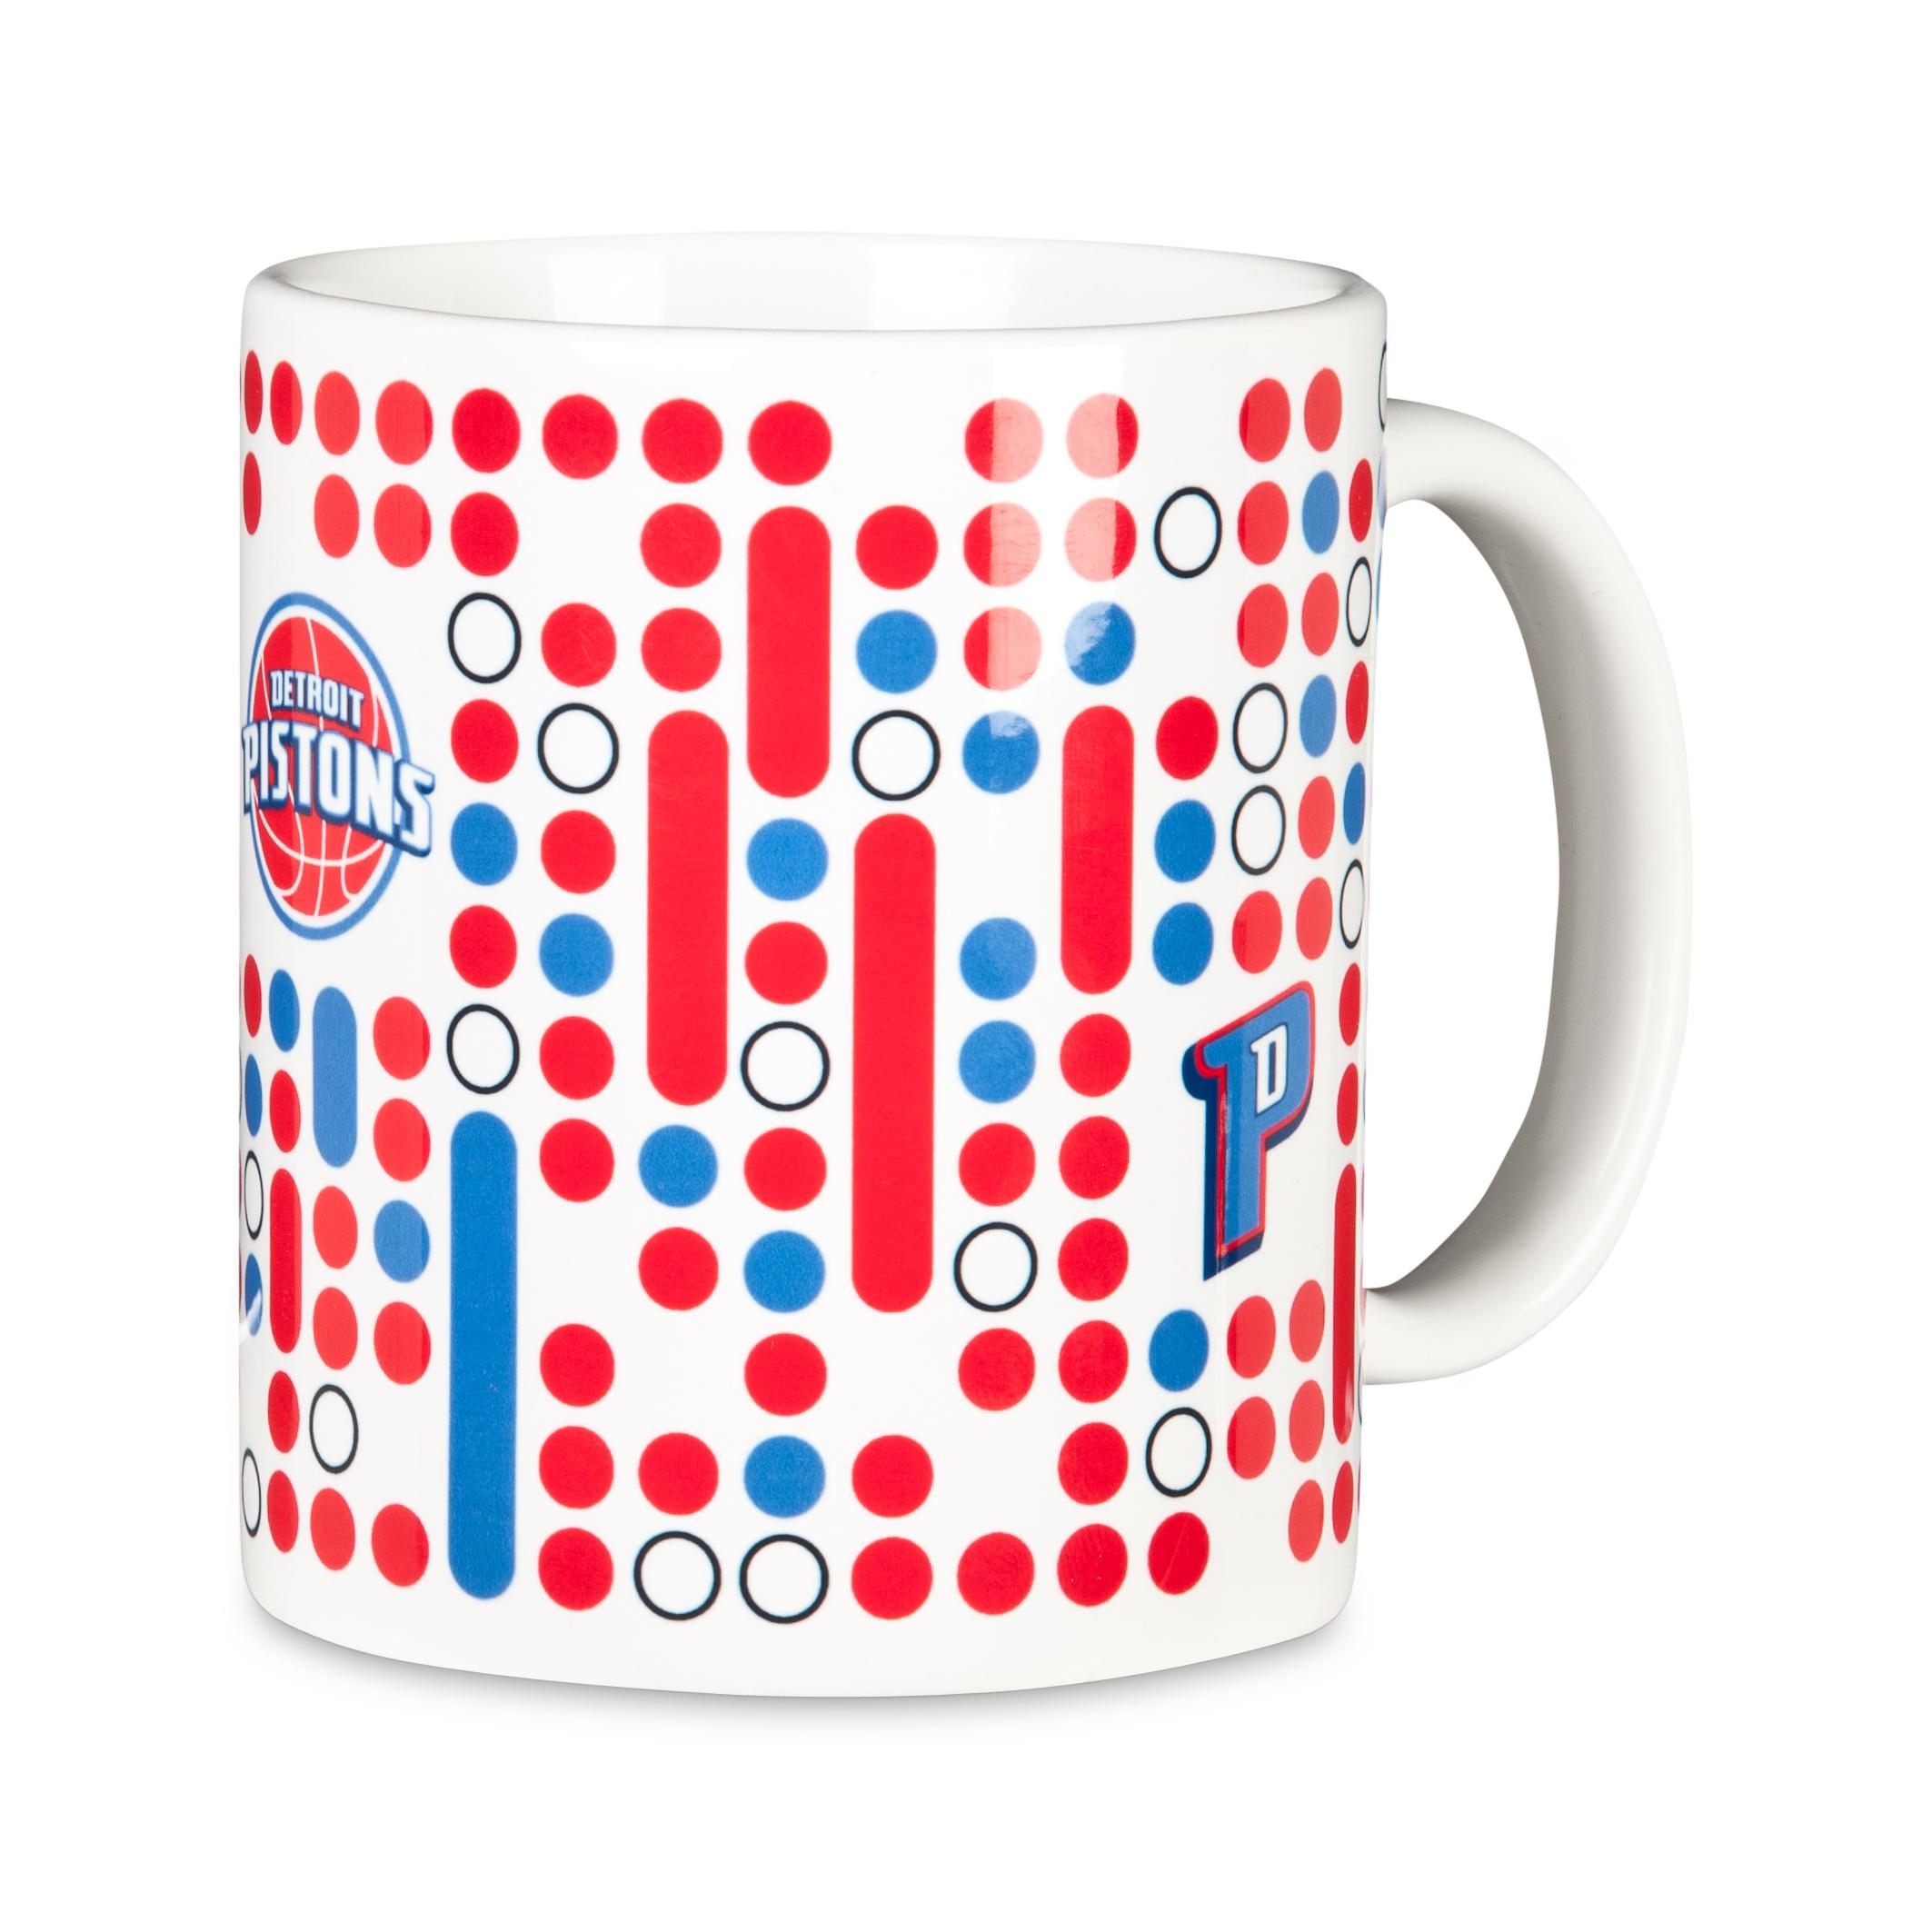 Detroit Pistons 11oz Mug